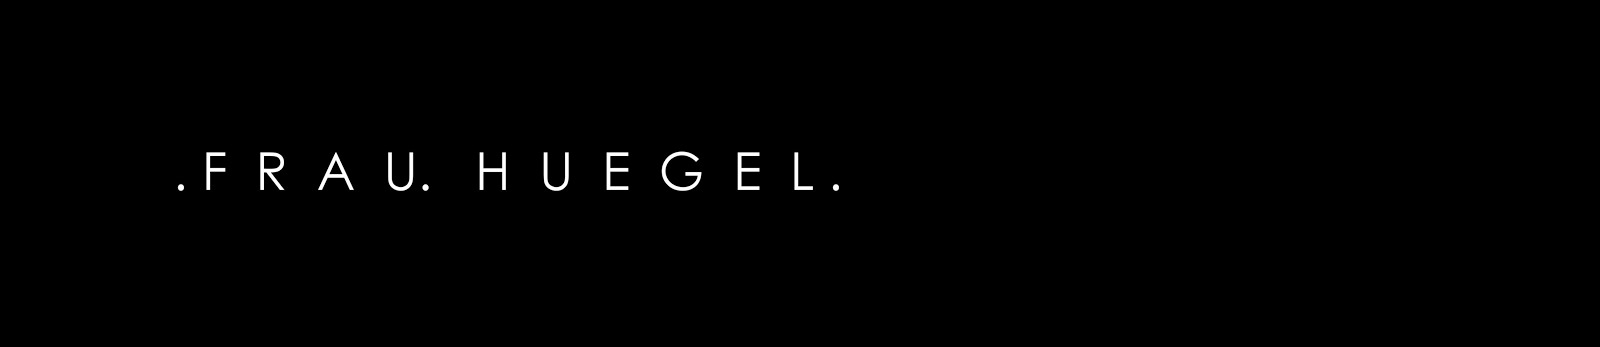 FRAU HUEGEL | MODEBLOG